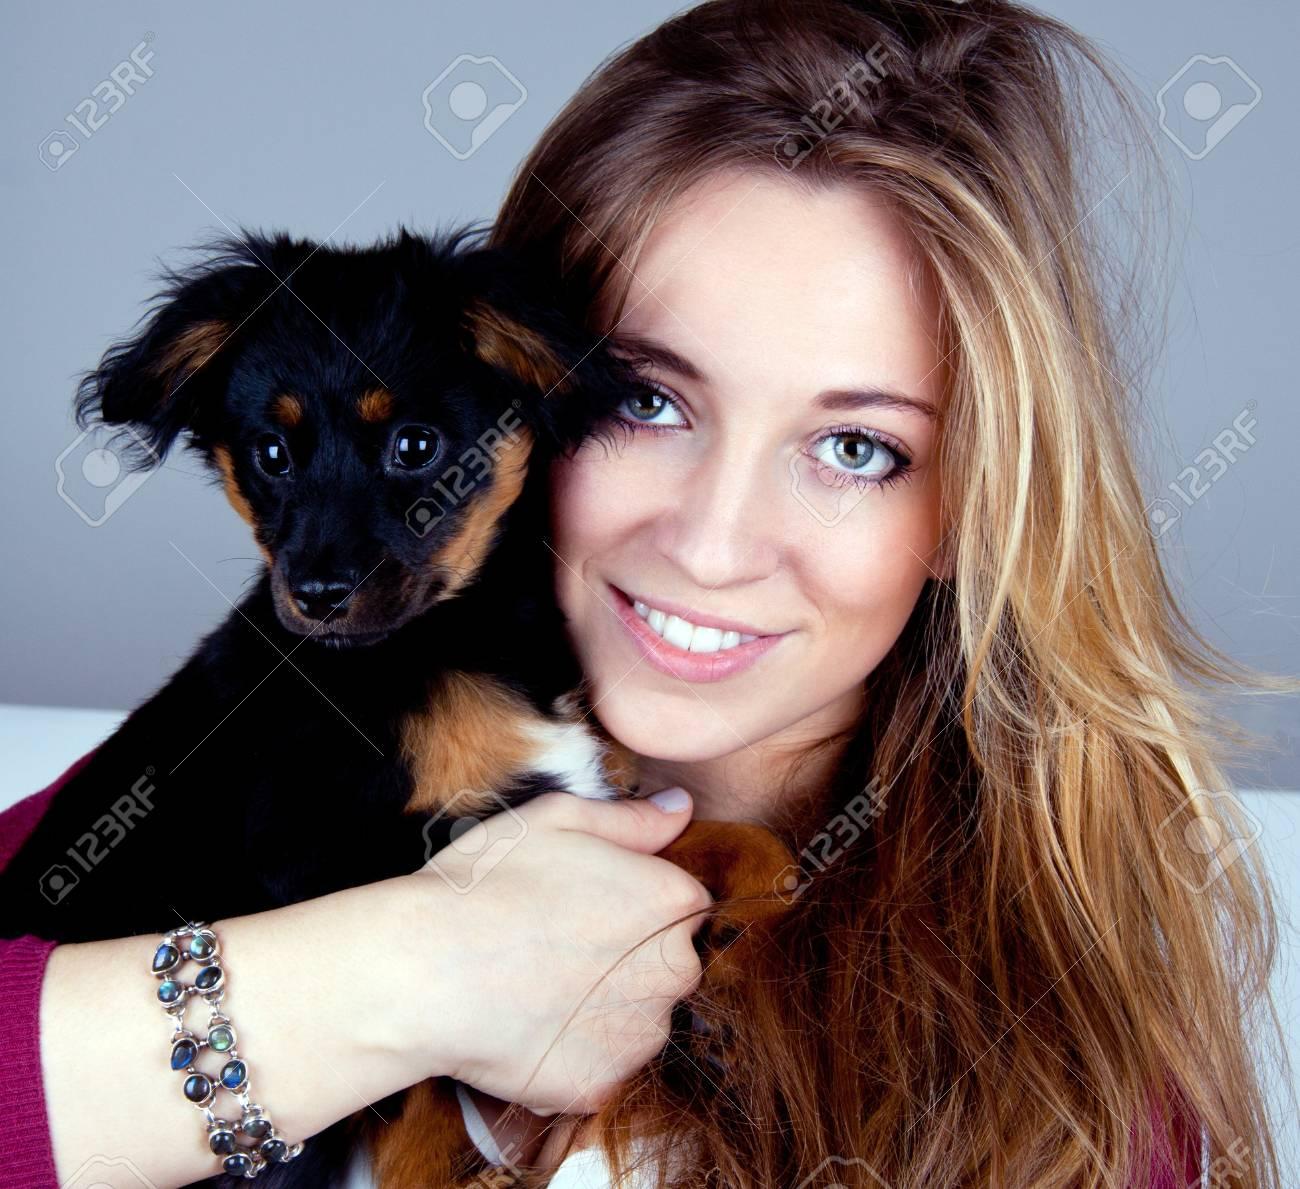 young beatiful girl with a cute little dog having fun Stock Photo - 13089363